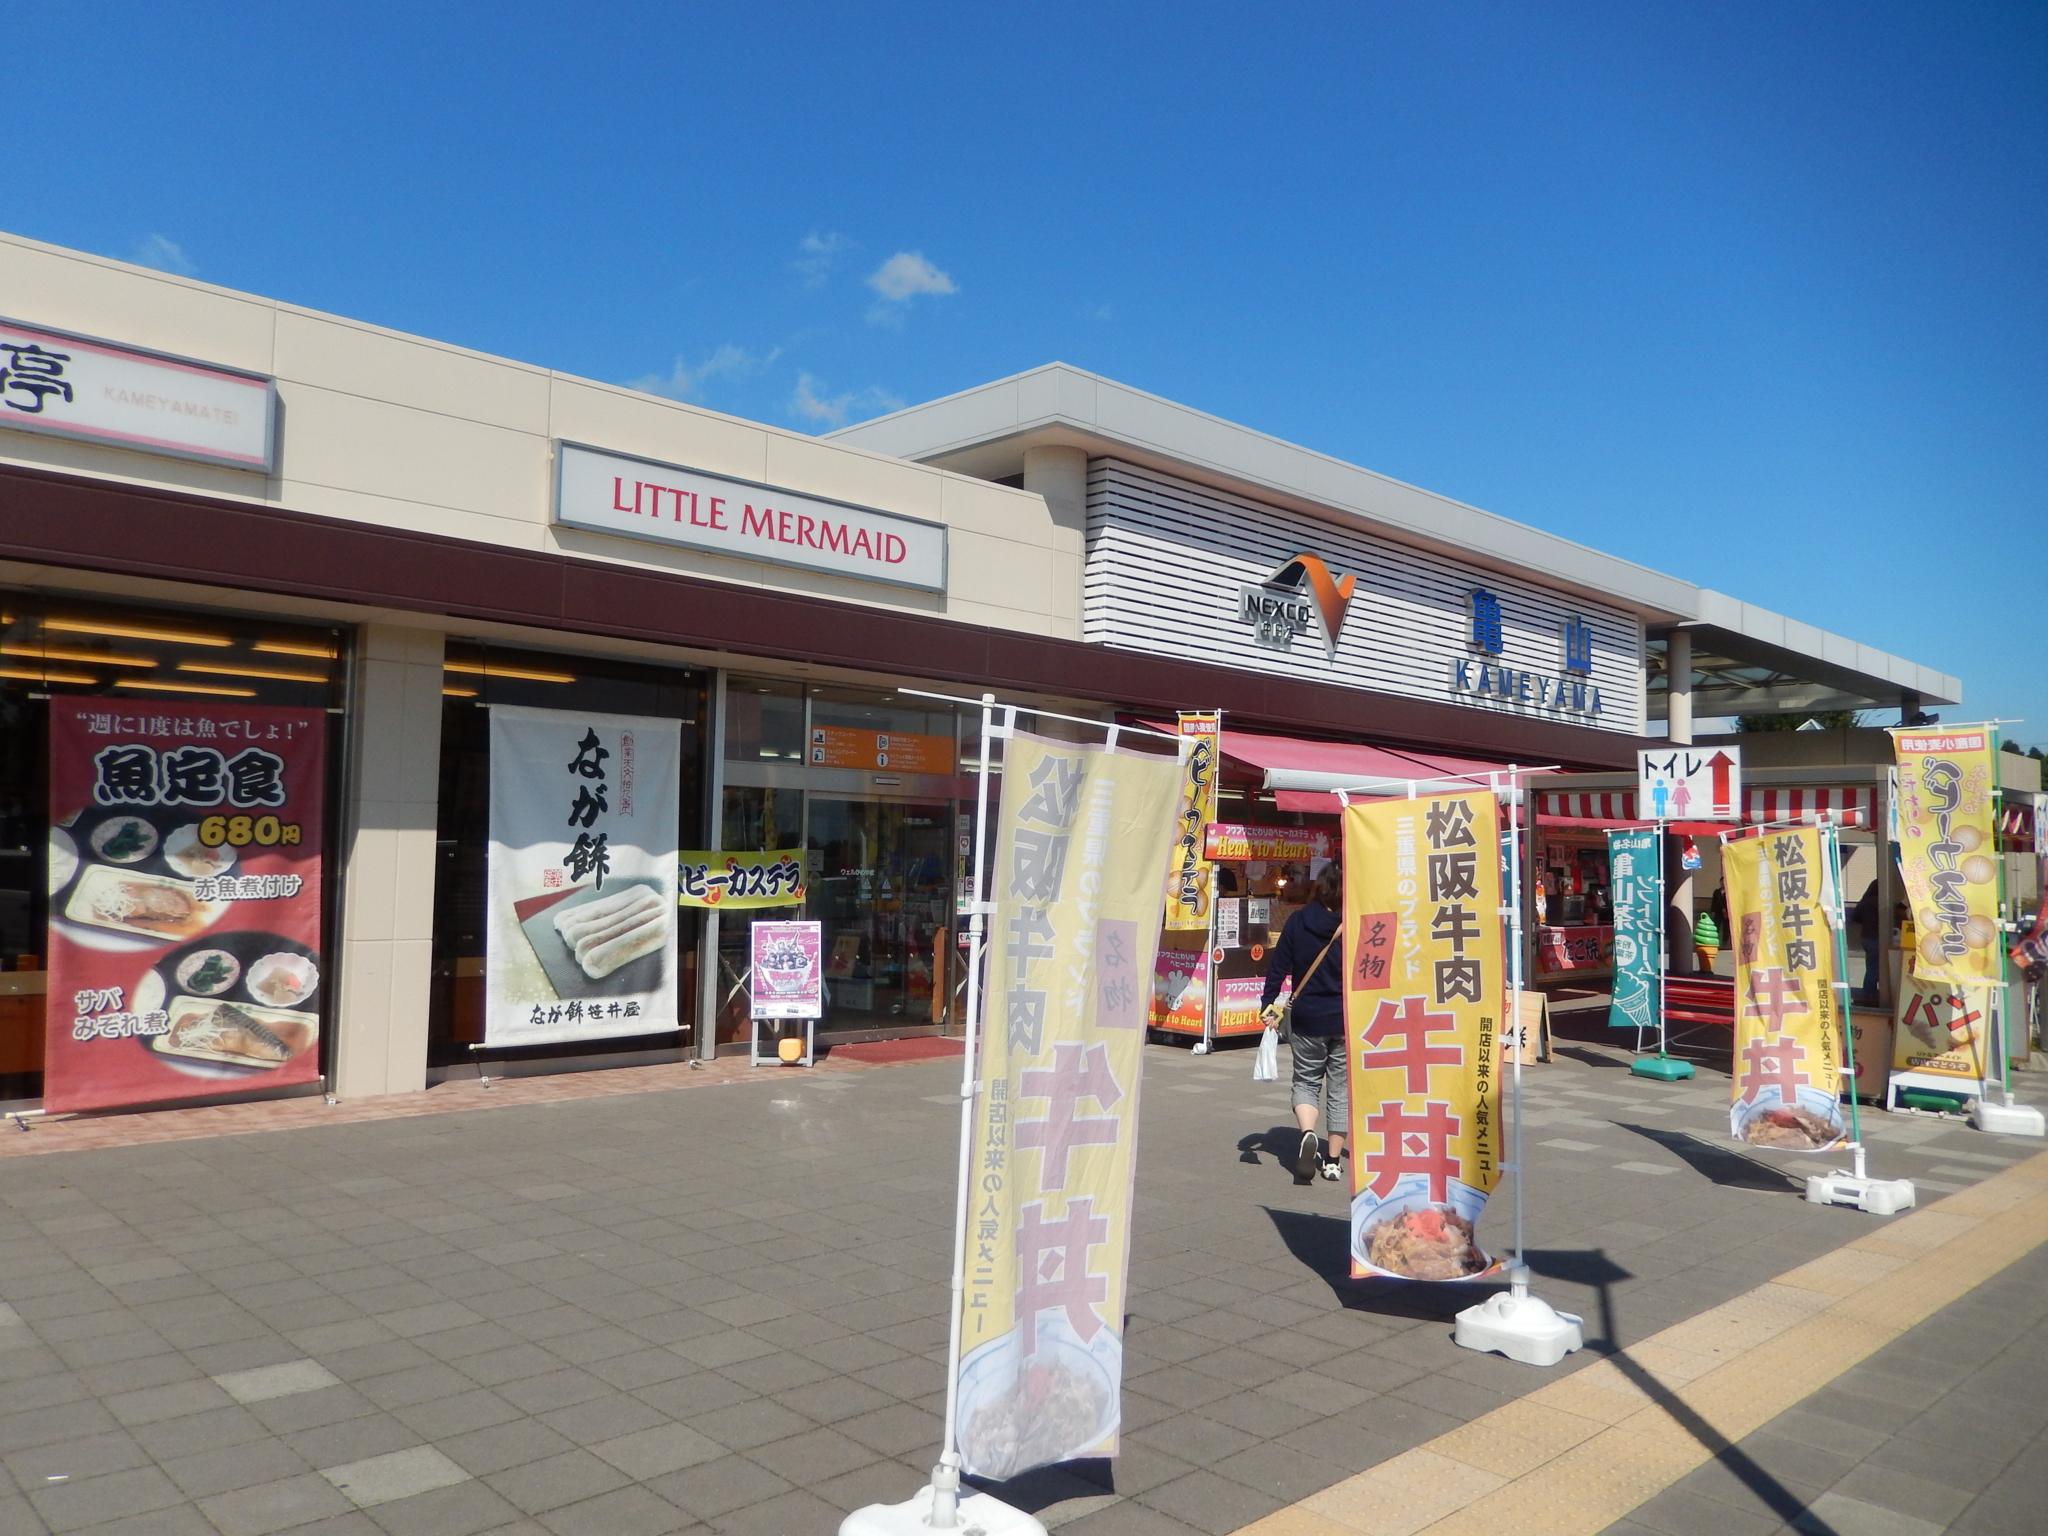 f:id:ToshUeno:20151012111908j:plain